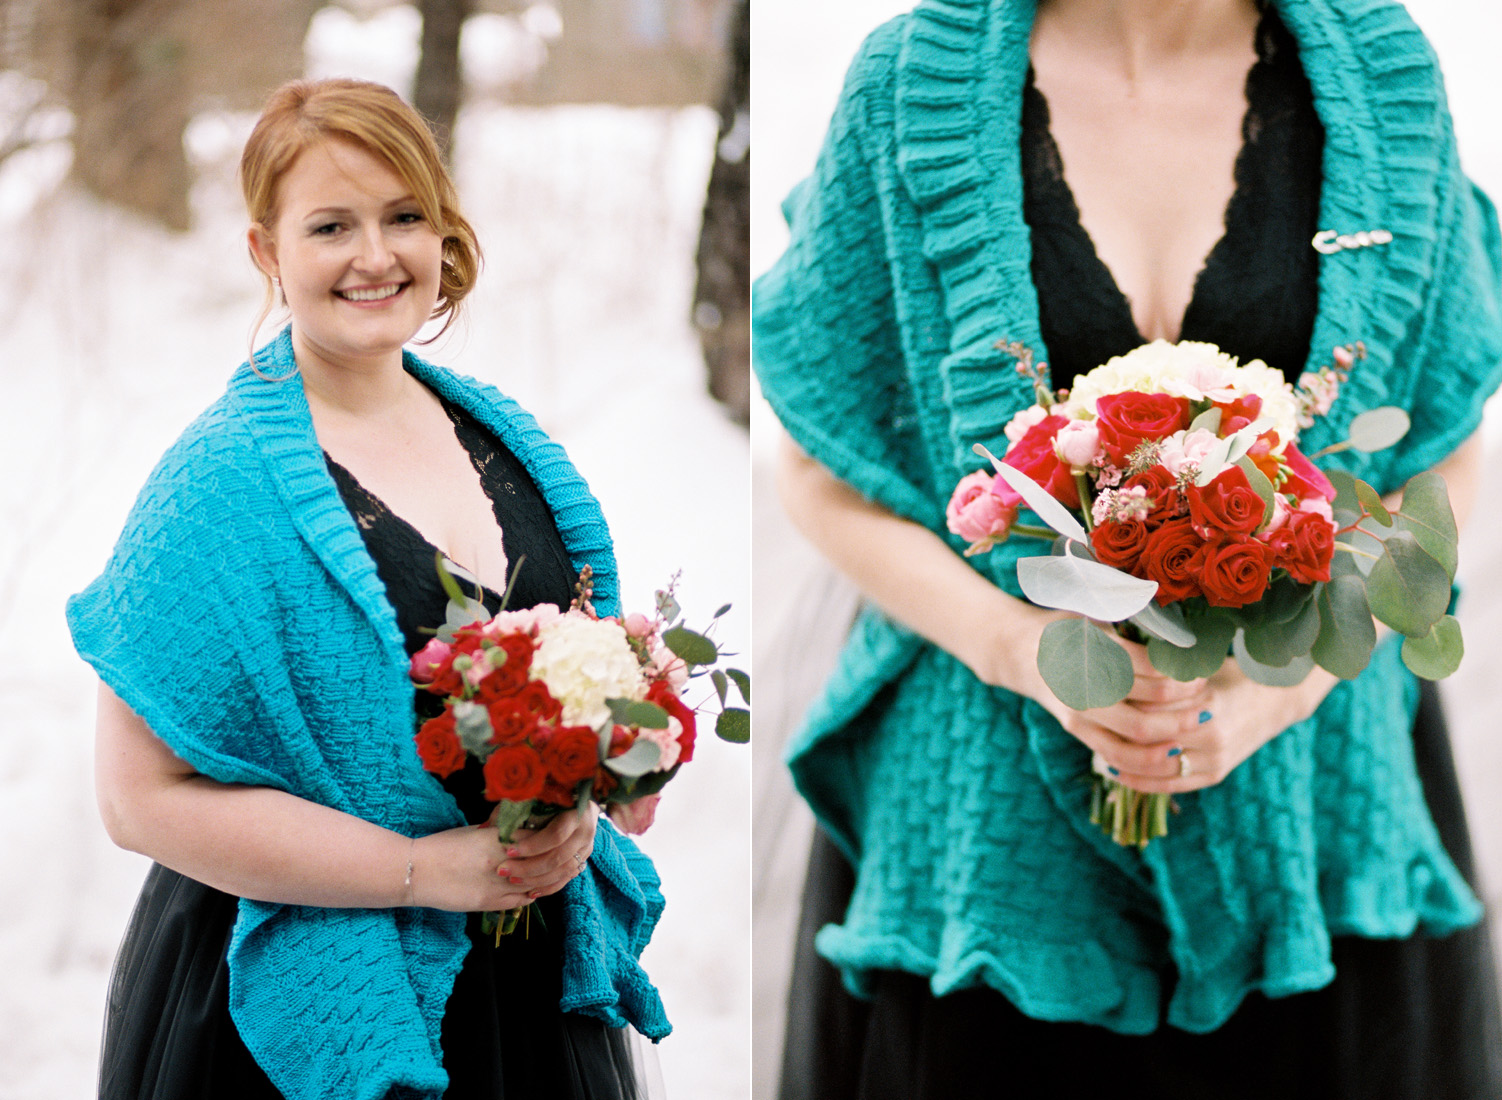 Winter Wedding Knit Wrap Bridesmaid Gift Idea.jpg